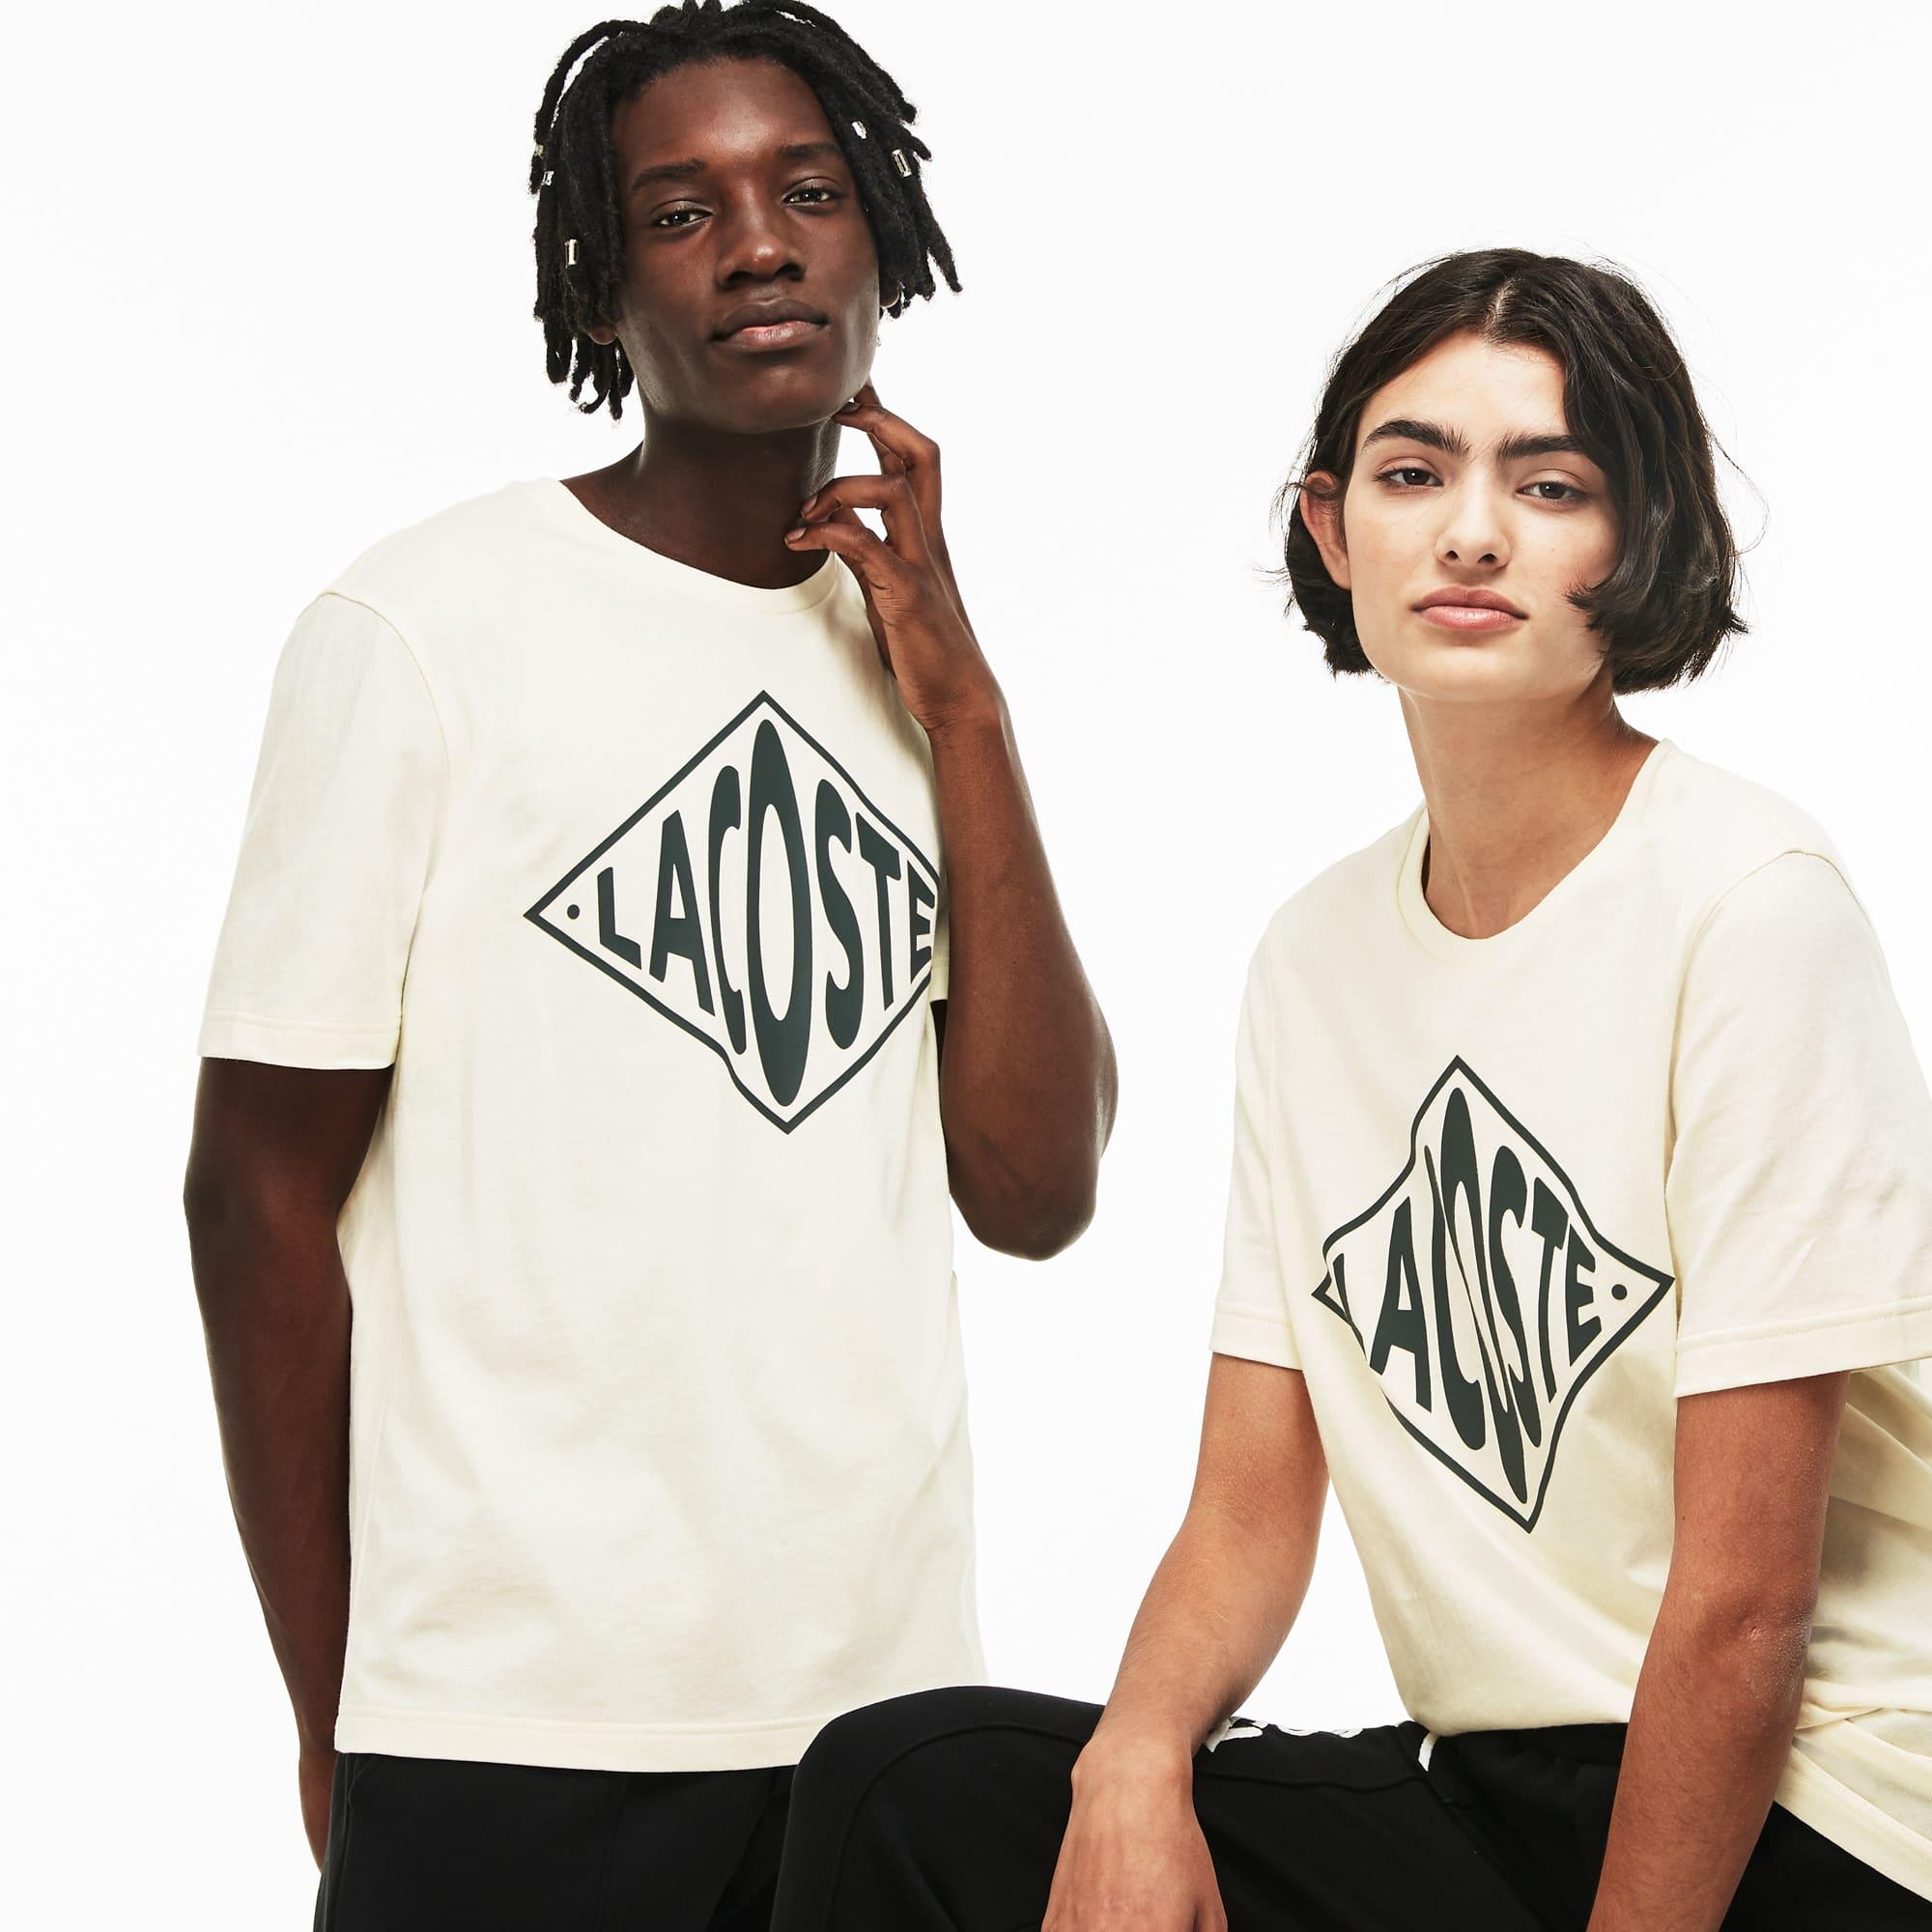 Lacoste LIVE-T-shirt unisex ronde hals jersey met oversized logo